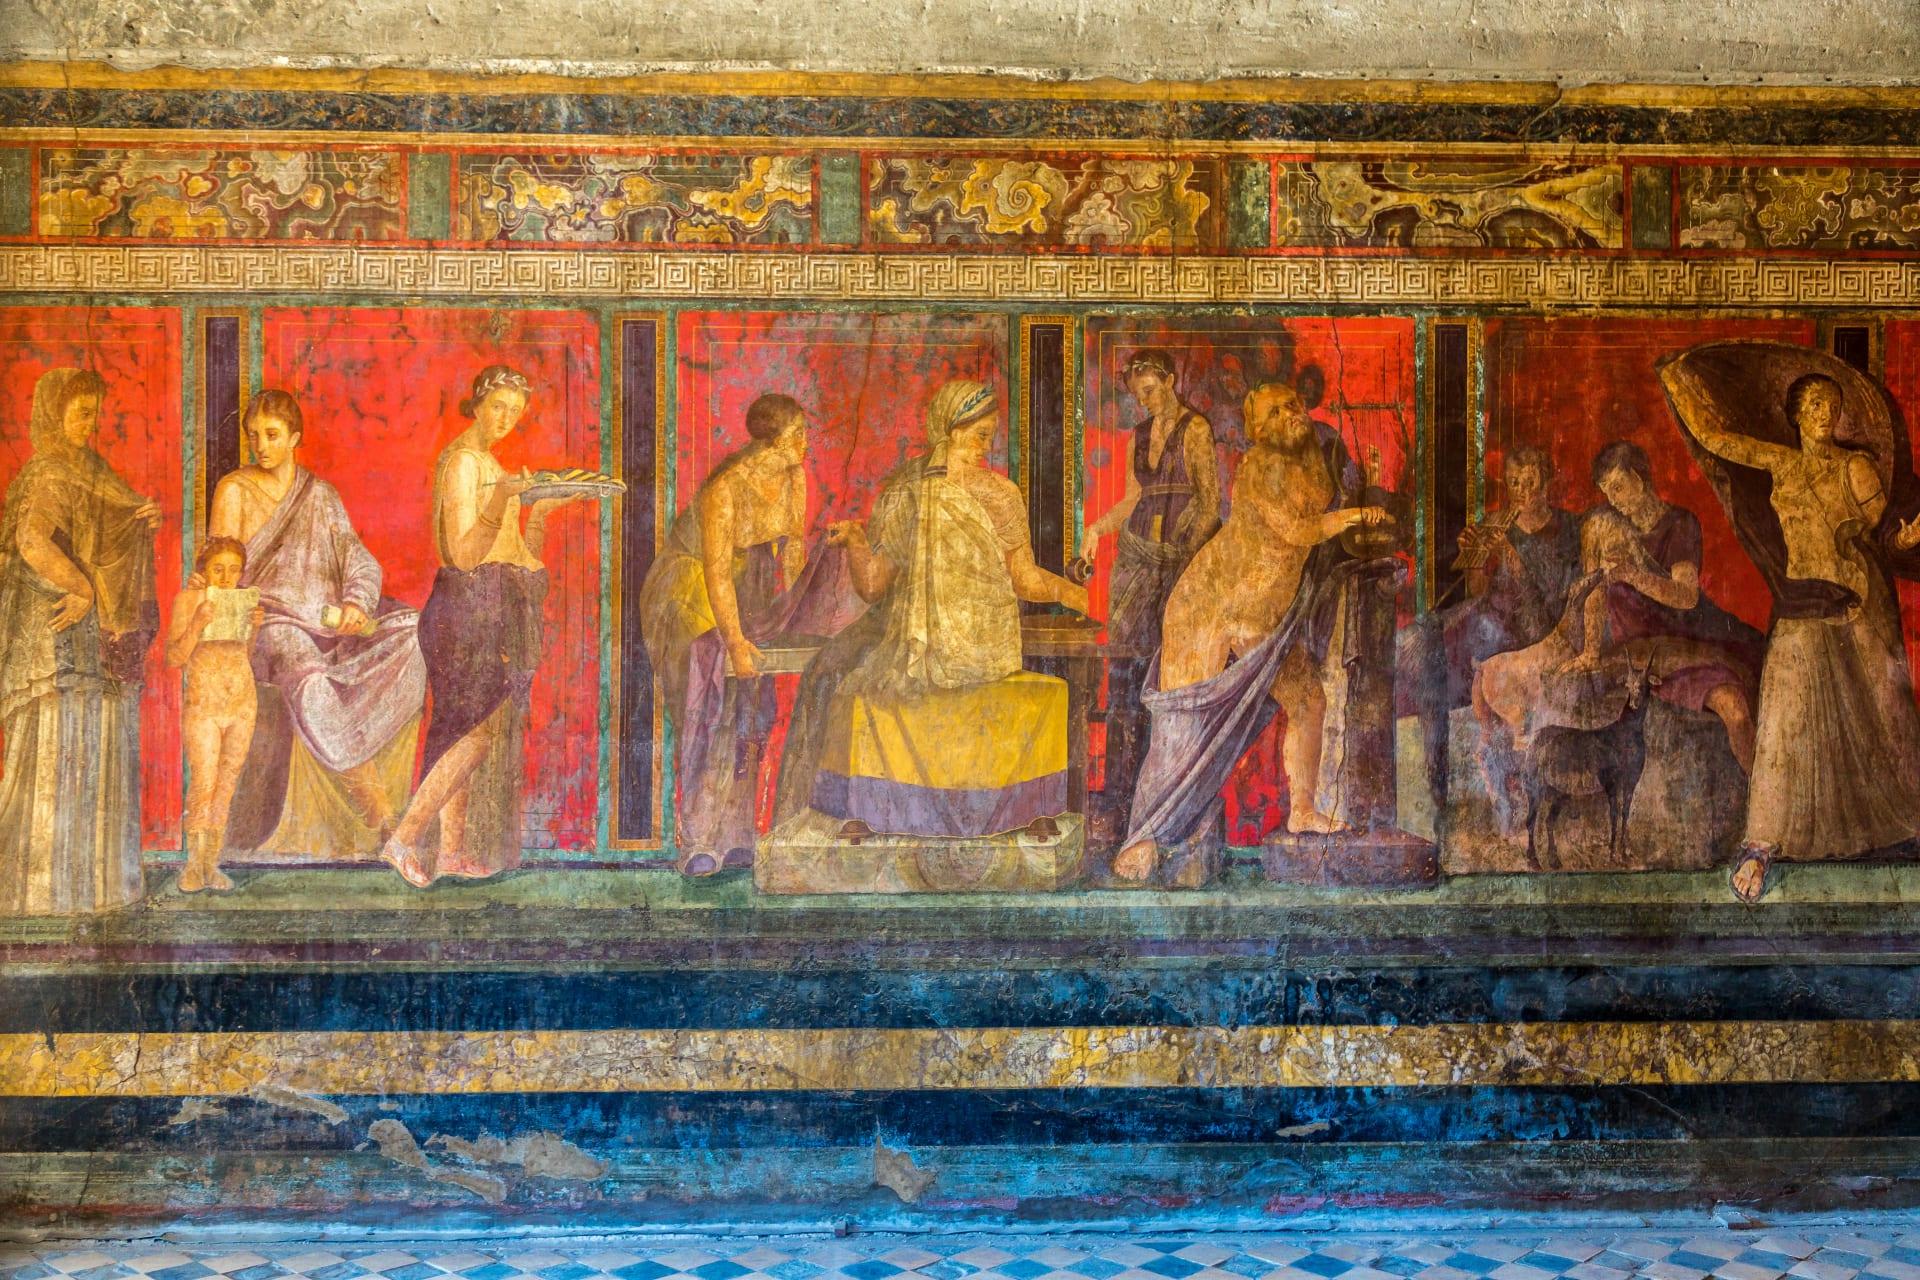 Pompeii and  Herculaneum - Pompeii Special: The Villa of Mysteries